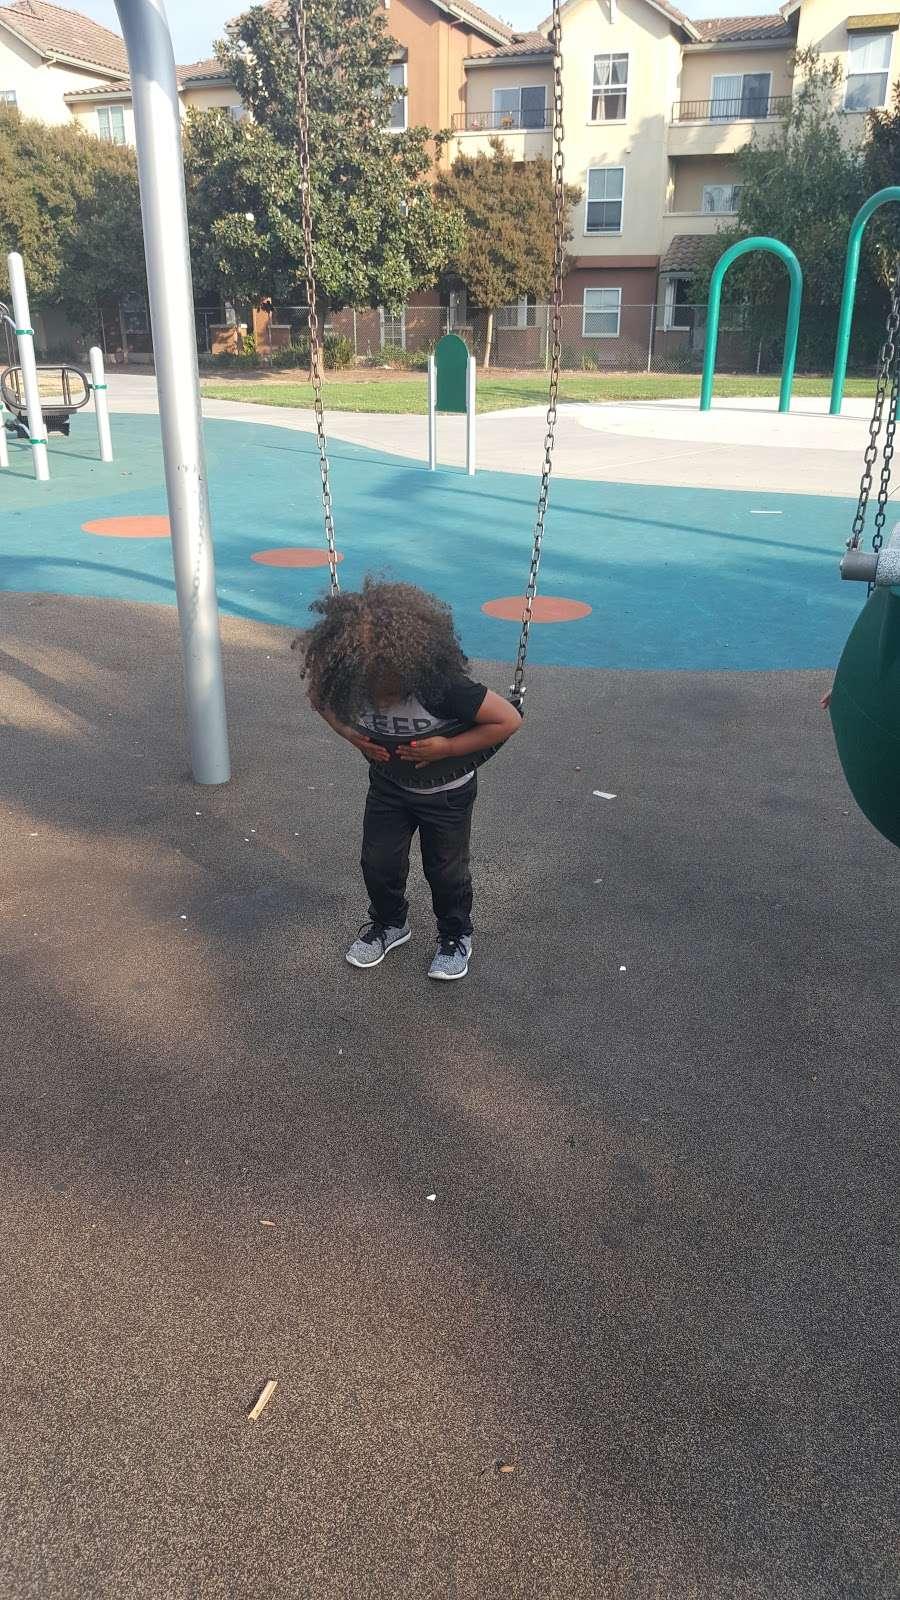 McLaughlin Park - park  | Photo 2 of 10 | Address: 1092 Owsley Ave, San Jose, CA 95122, USA | Phone: (408) 535-3500